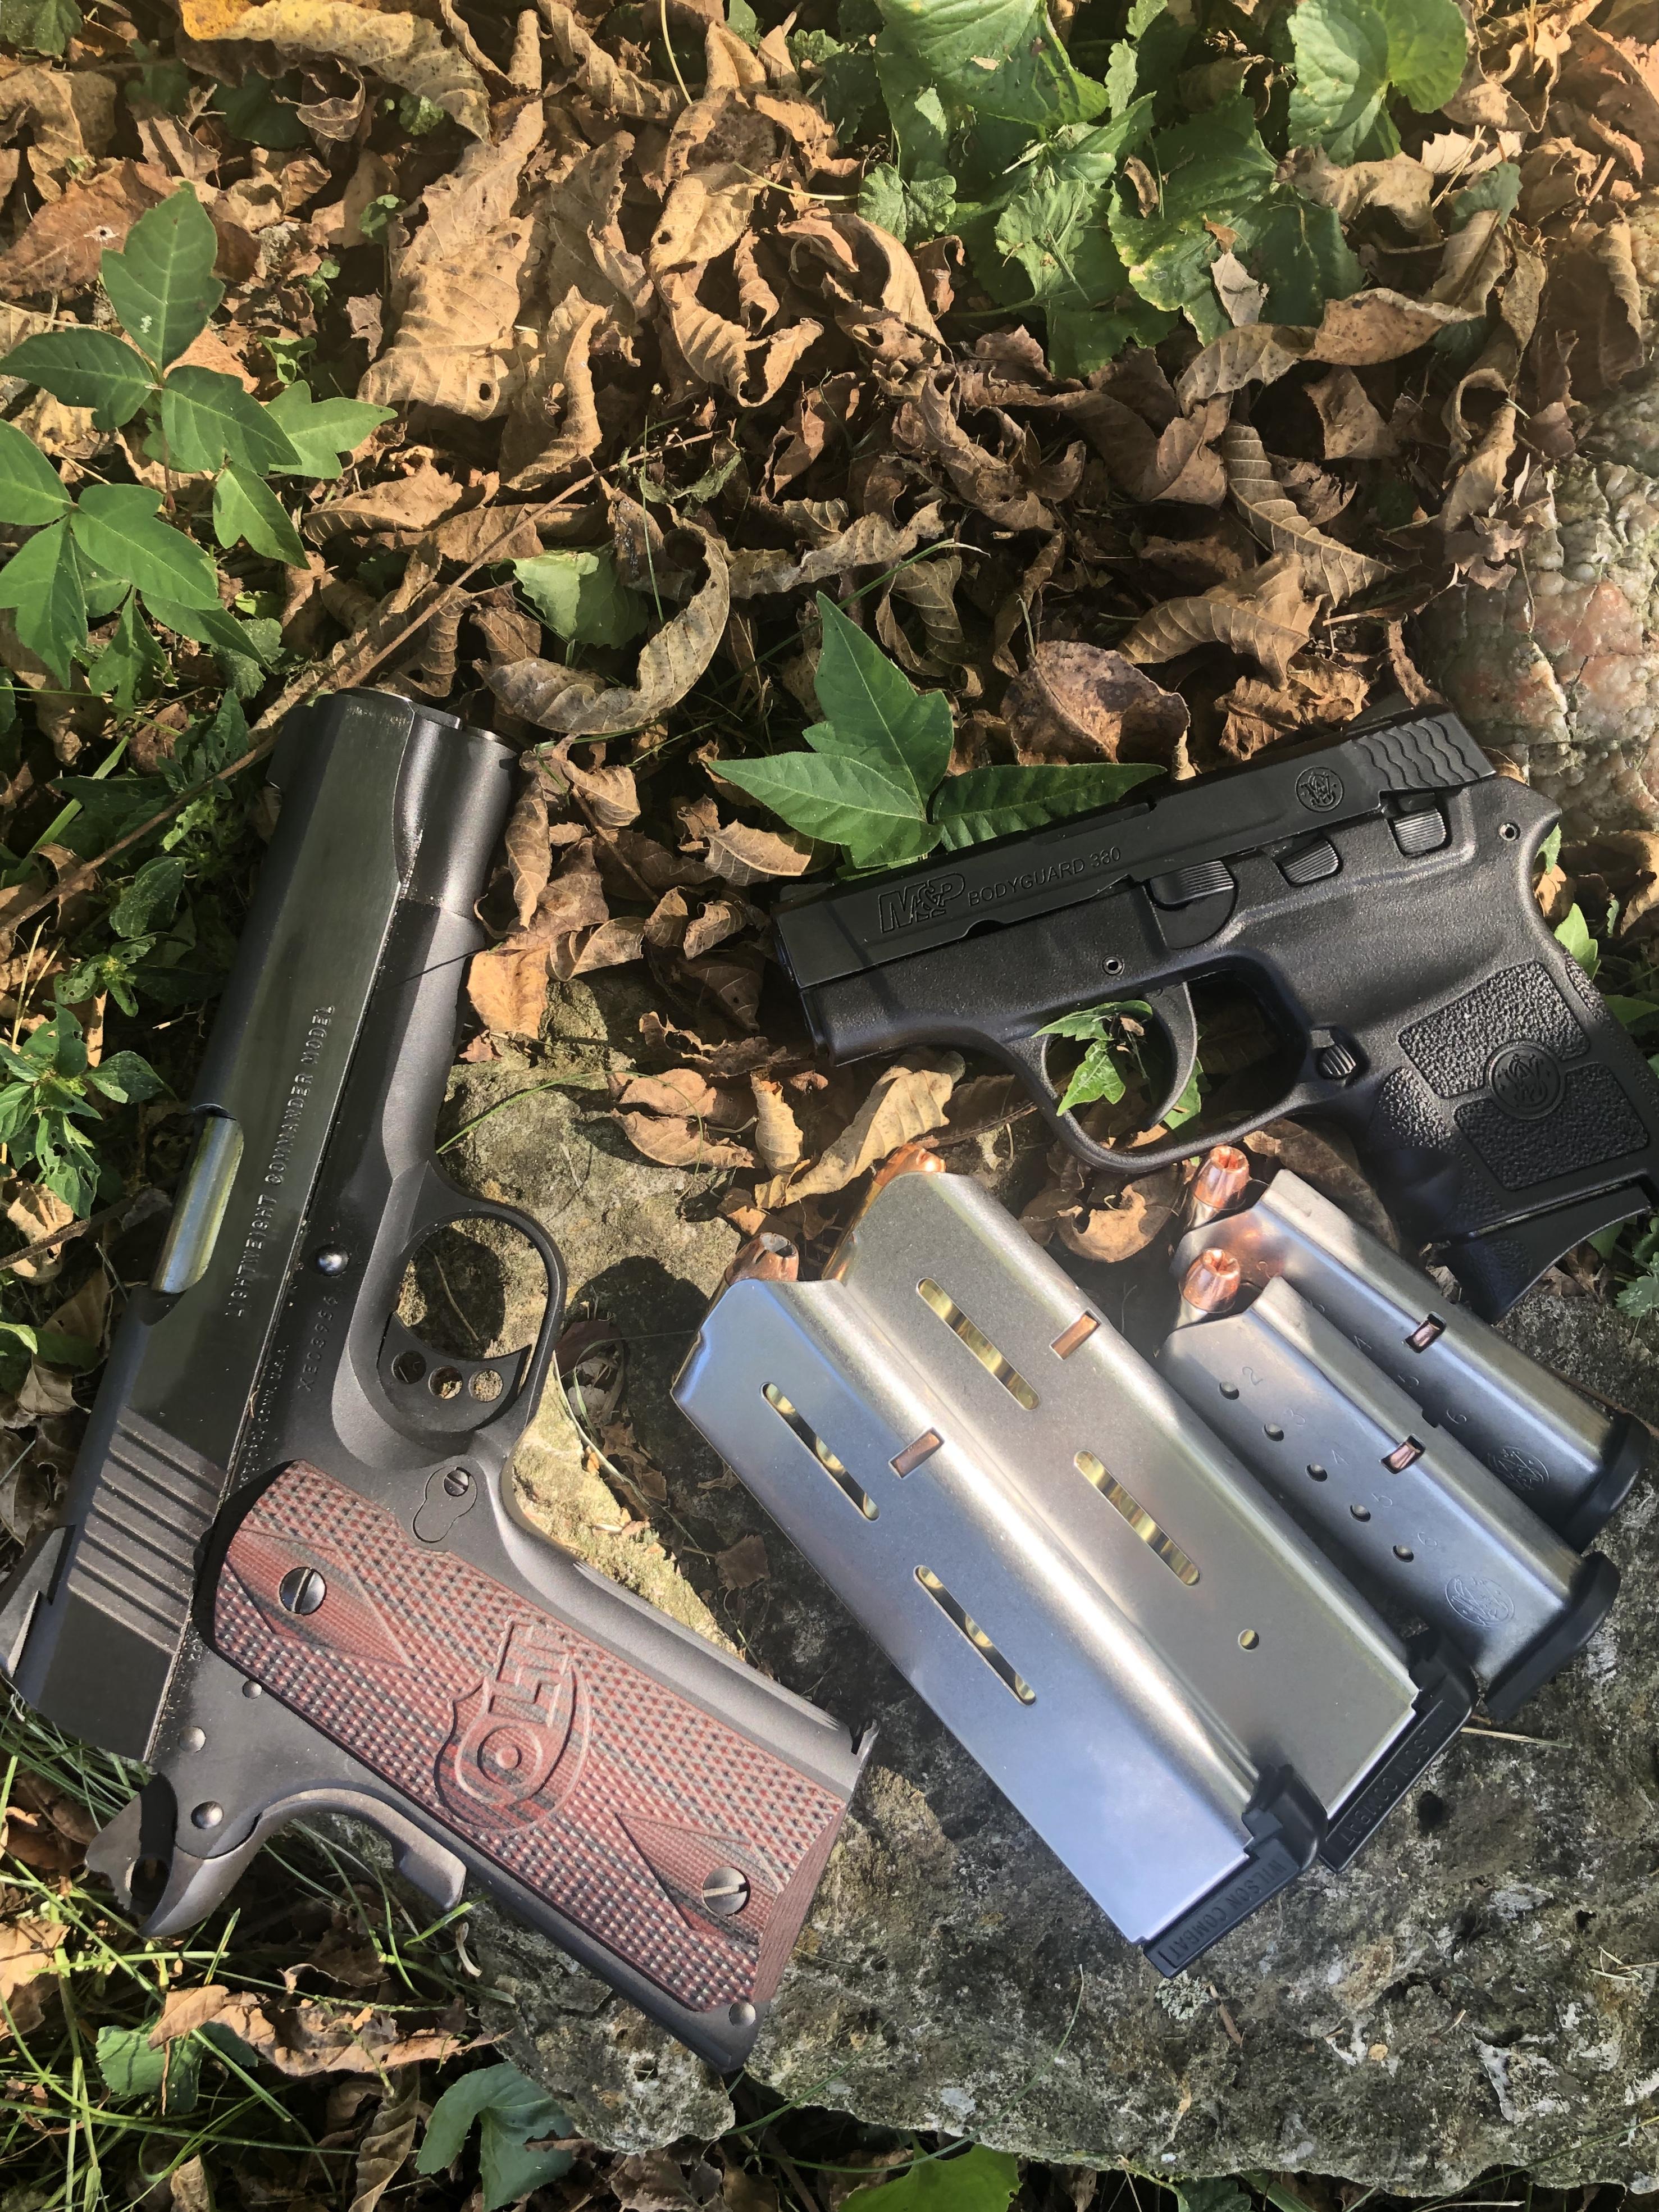 Do you carry 2 guns?-77254c5a-4488-4ead-a2f9-09dfd9871d9d.jpeg